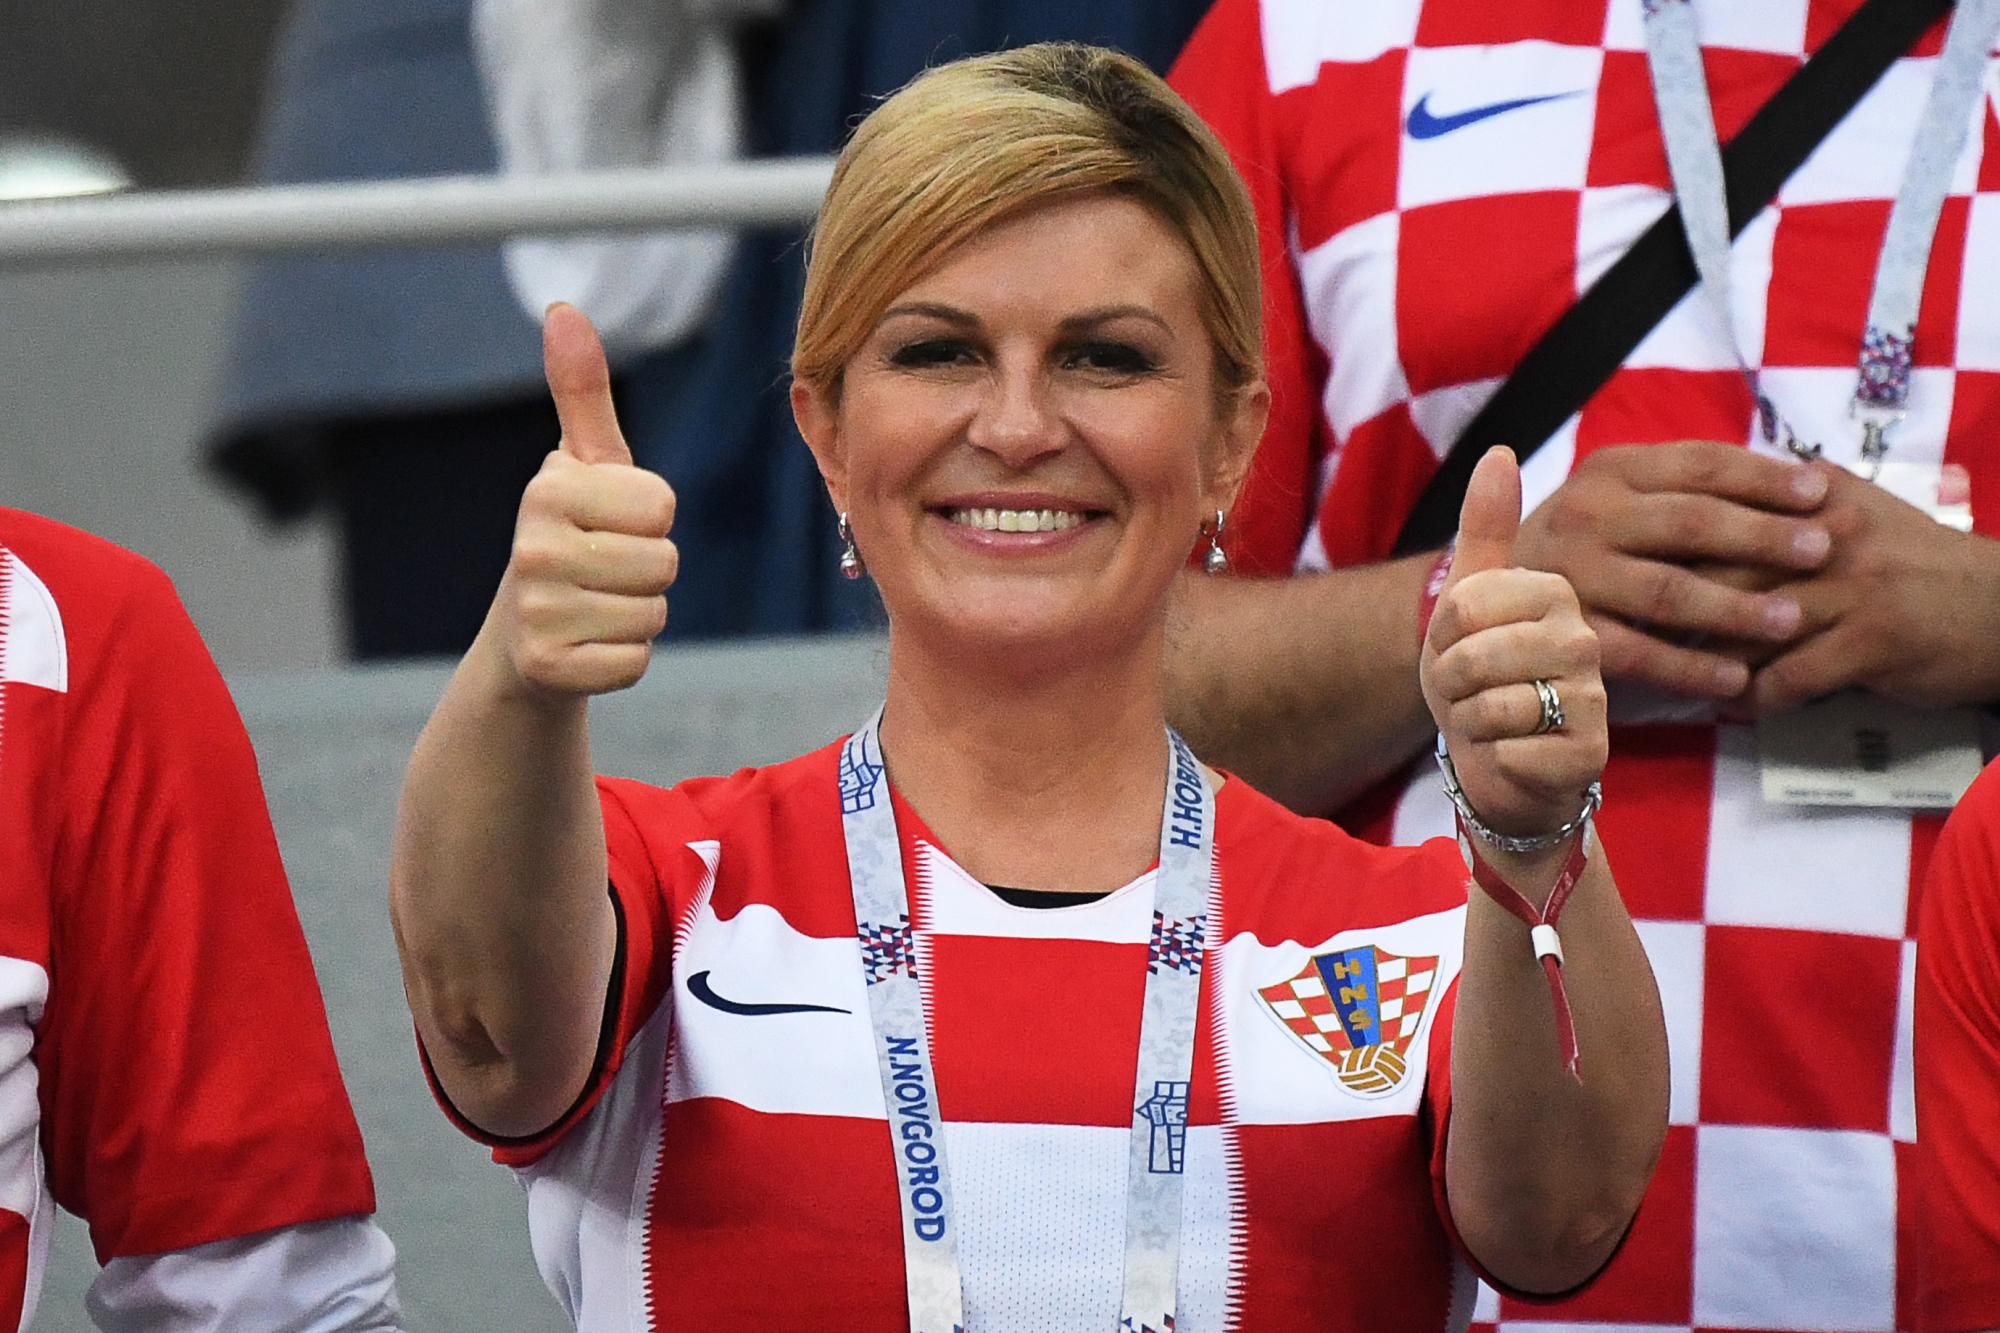 La presidenta de Croacia, Kolinda Grabar-Kitarovic, durante la Copa del Mundo en Rusia